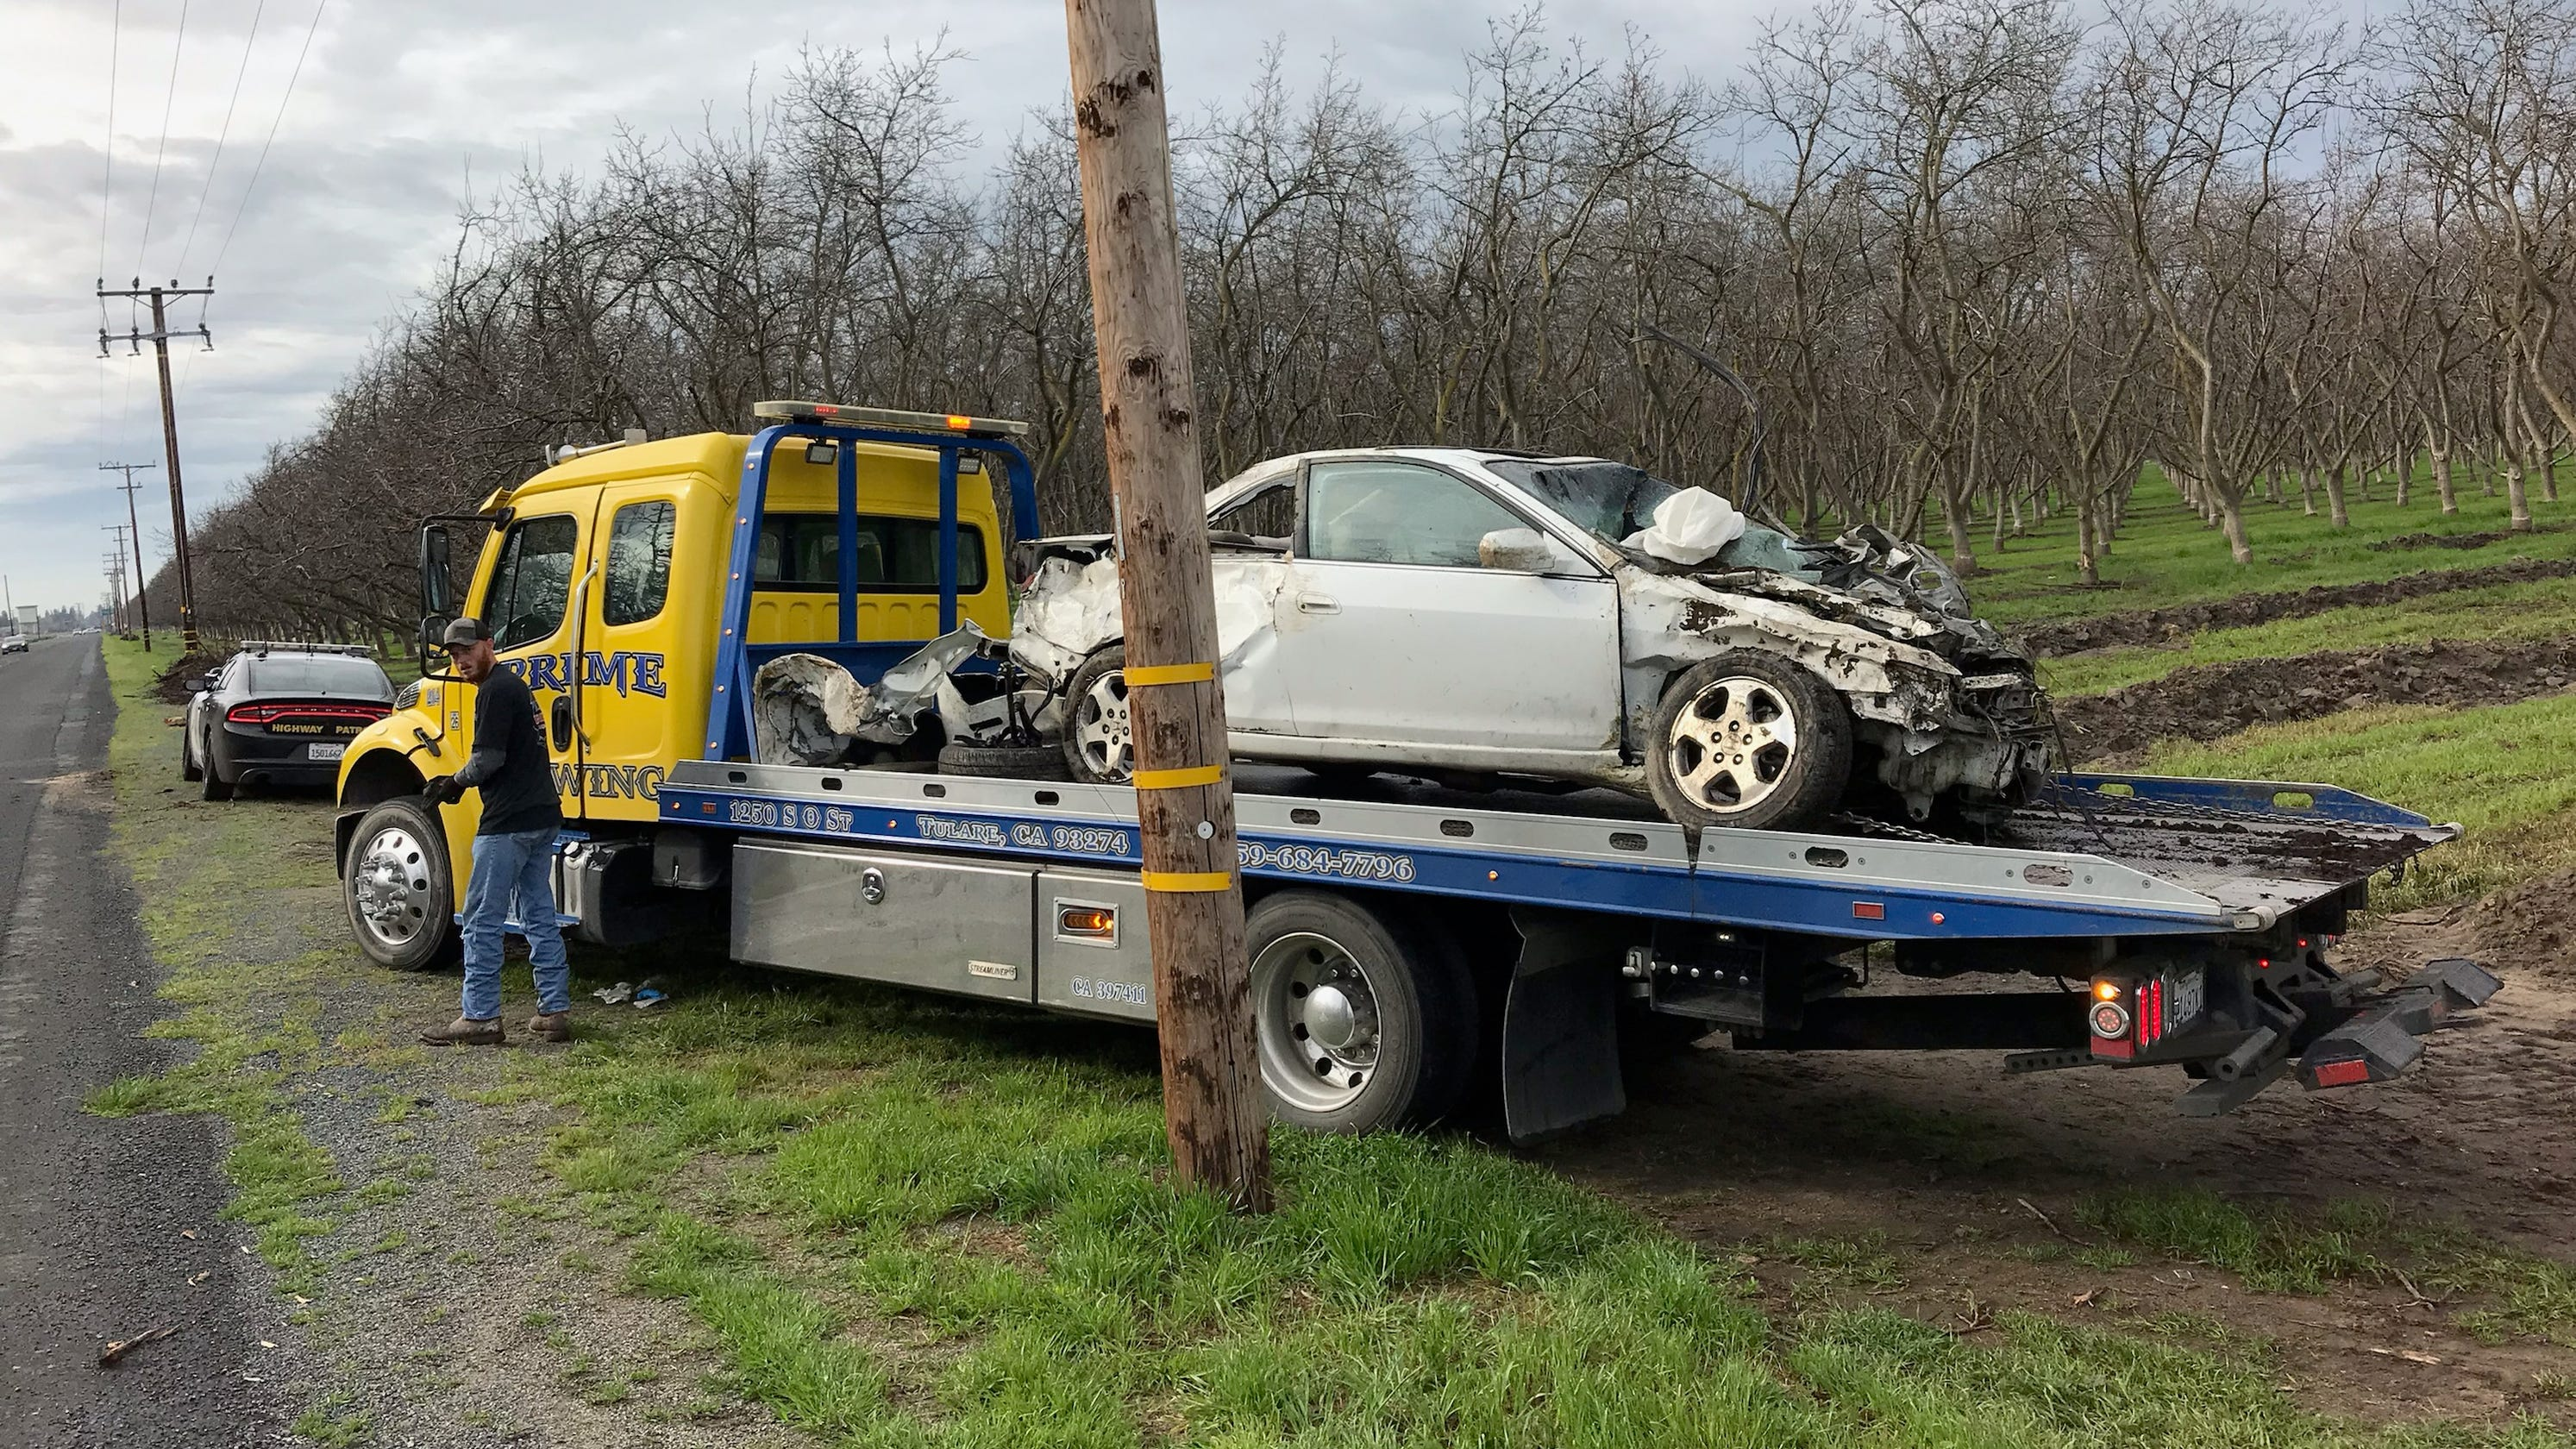 19-year-old Visalia woman dies in single-vehicle crash